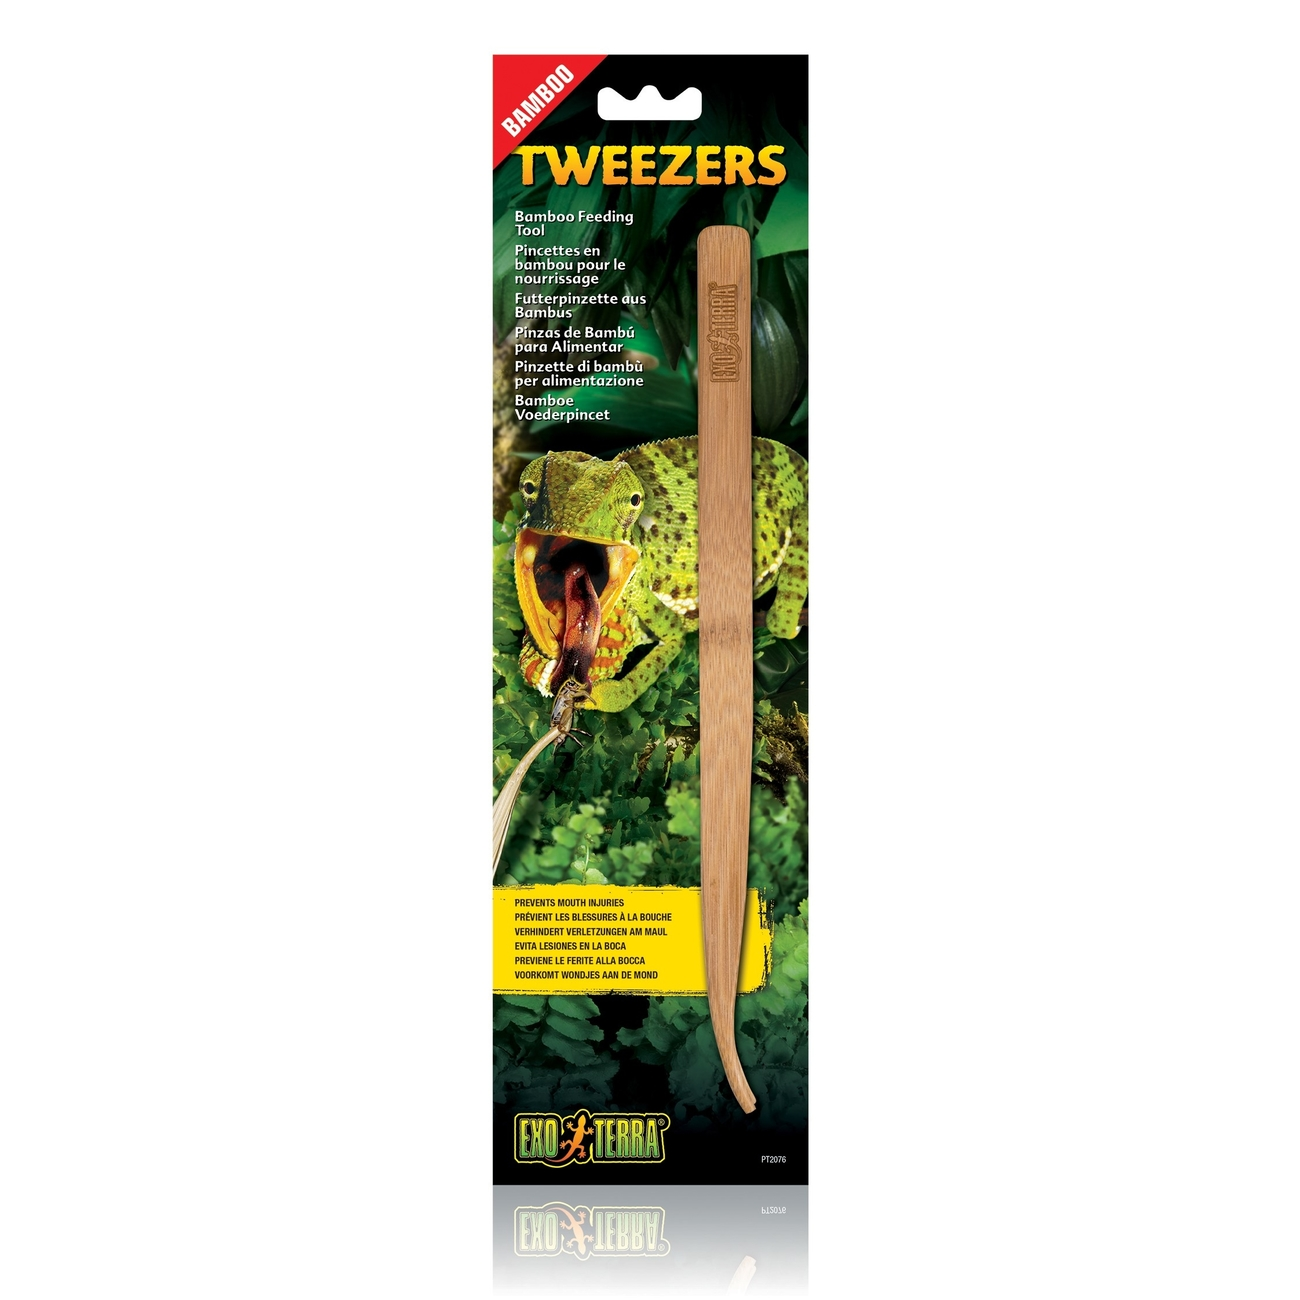 Hagen Exo Terra - Futterpinzette aus Bambus, Futterpinzette (1,7 x 29 x 1,7 cm)